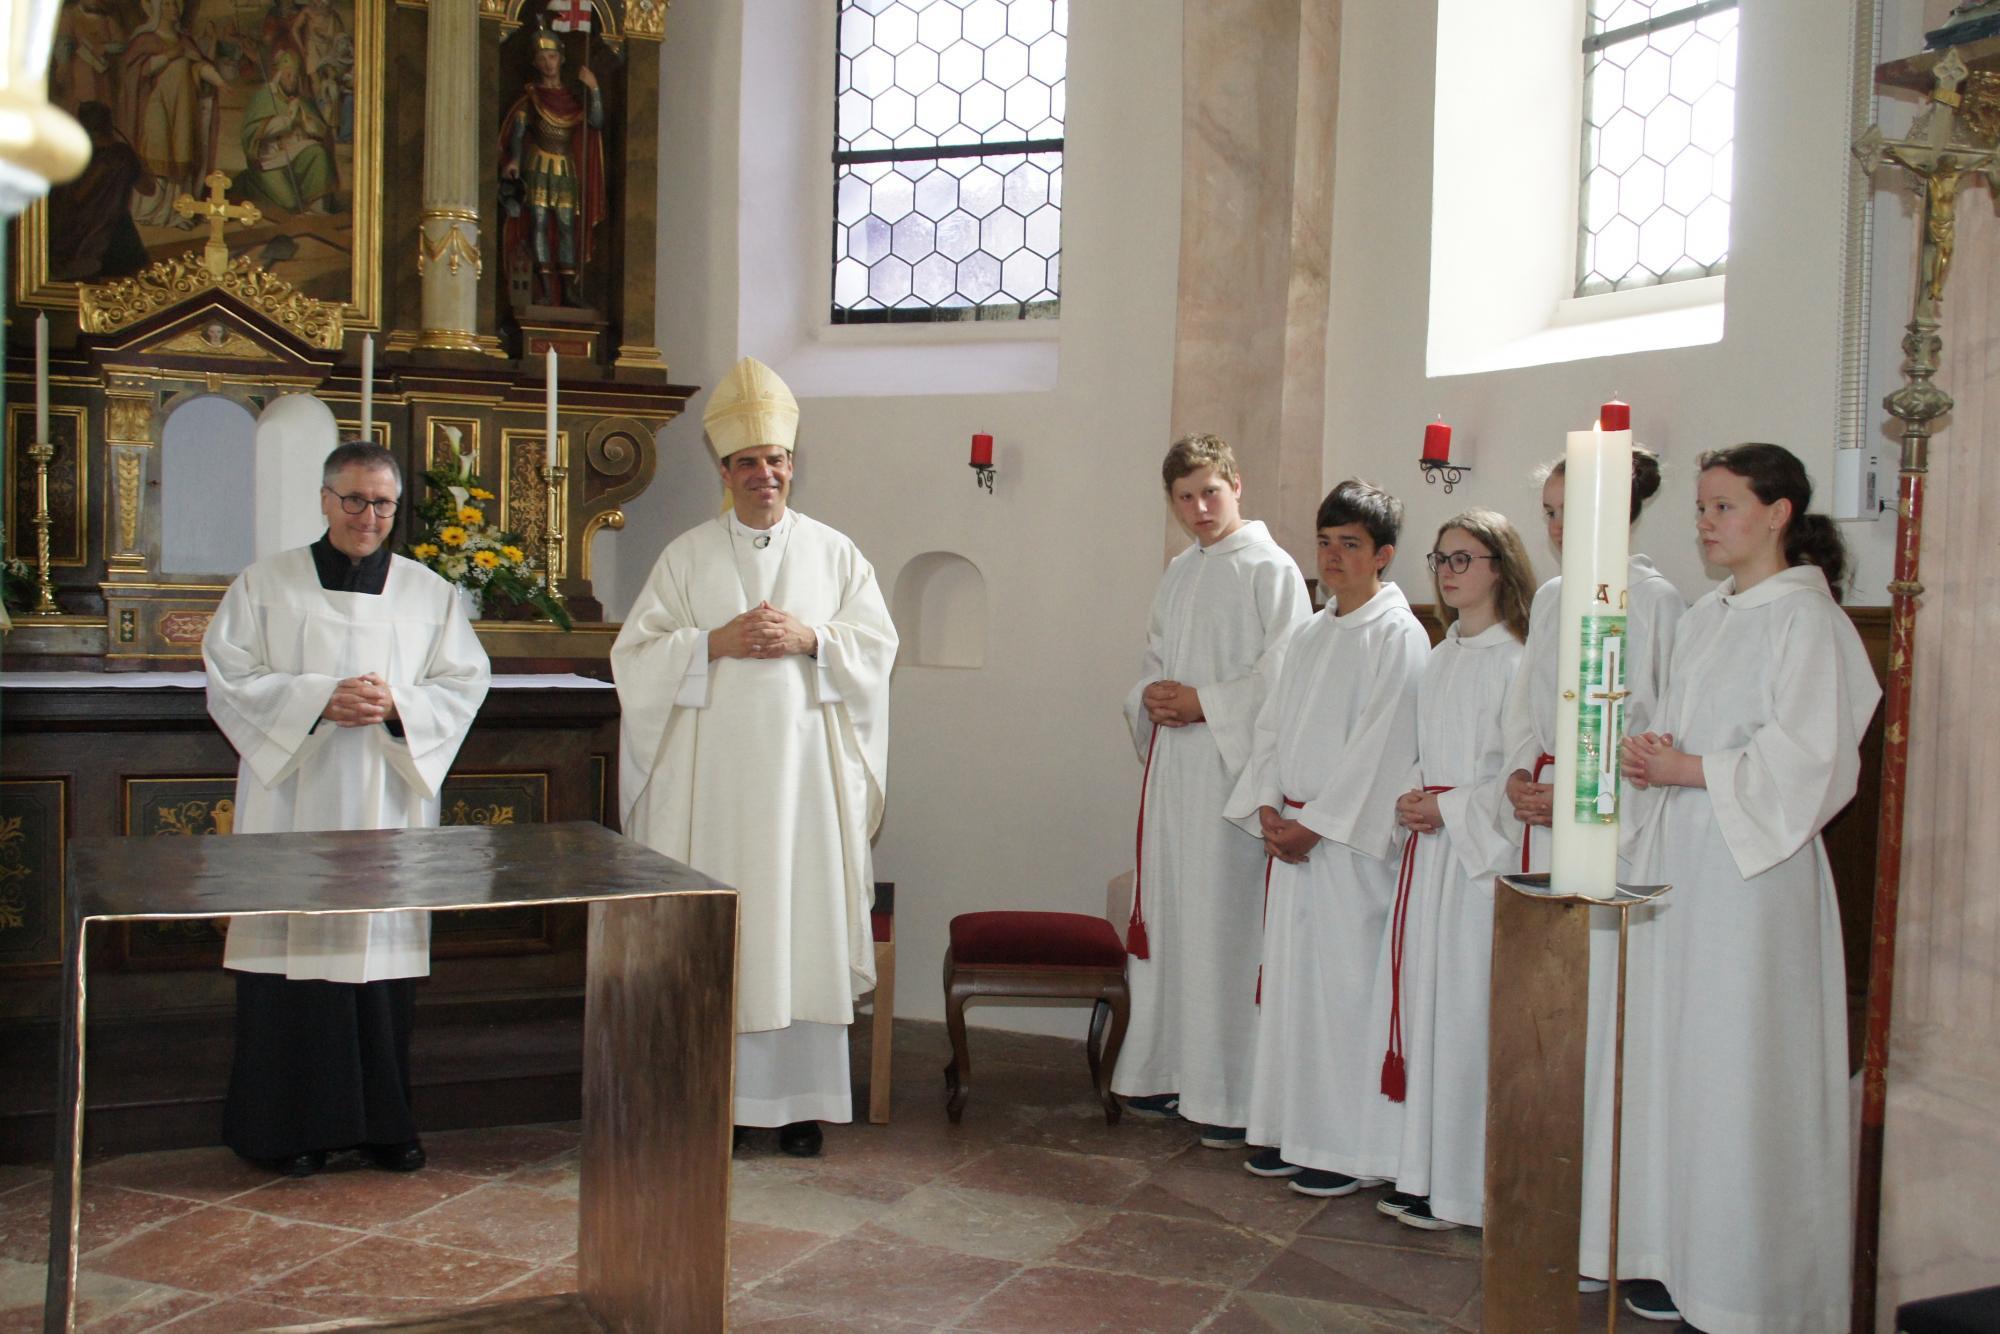 Altarweihe-Lengsham-DSC06278